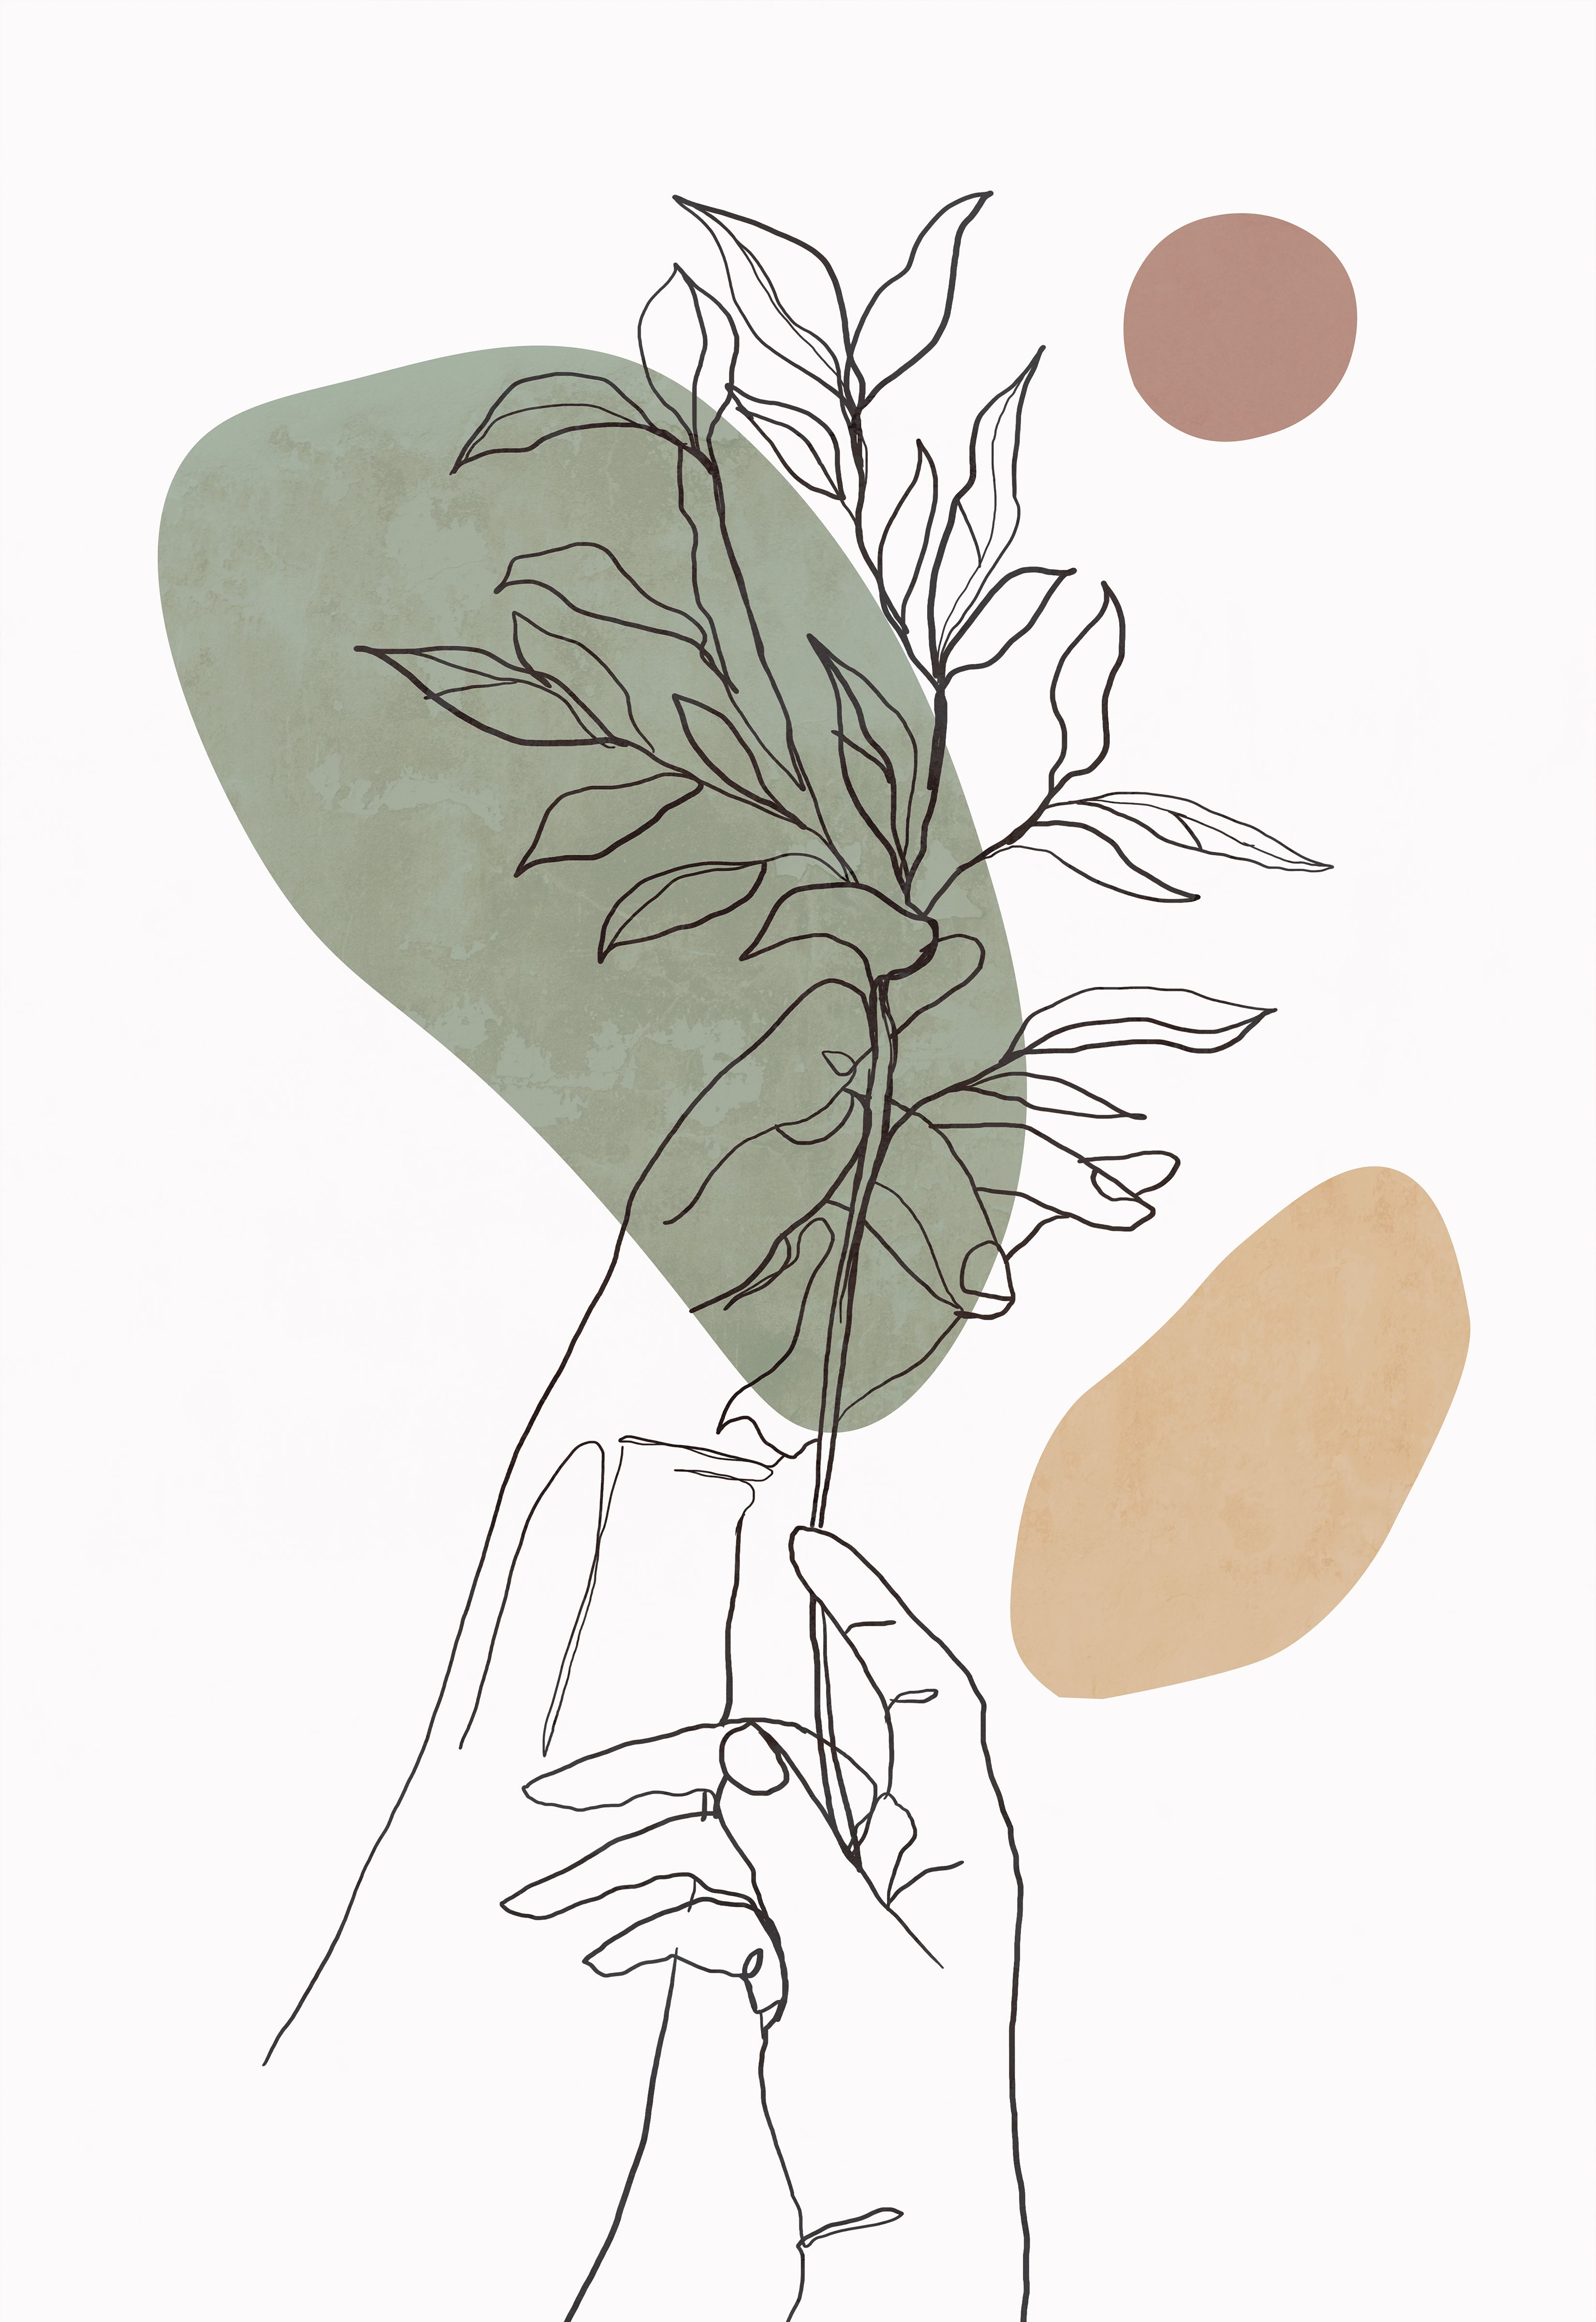 Abstract minimalist line art hands